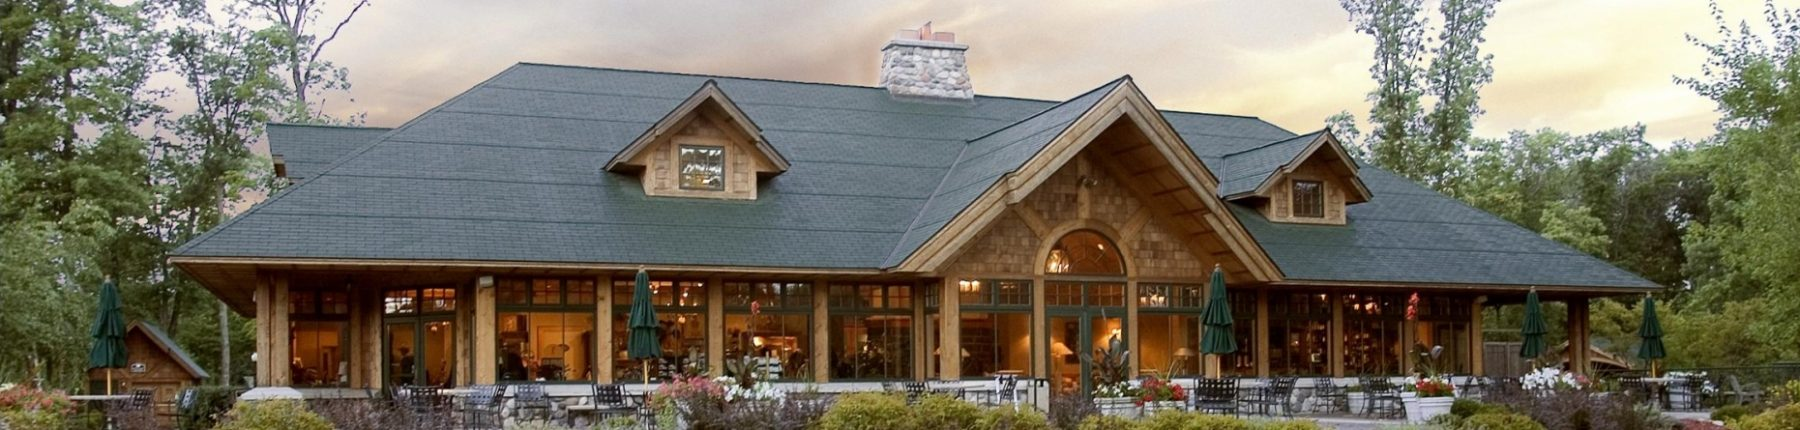 Classic Grill at Madden's - restaurants in Brainerd MN